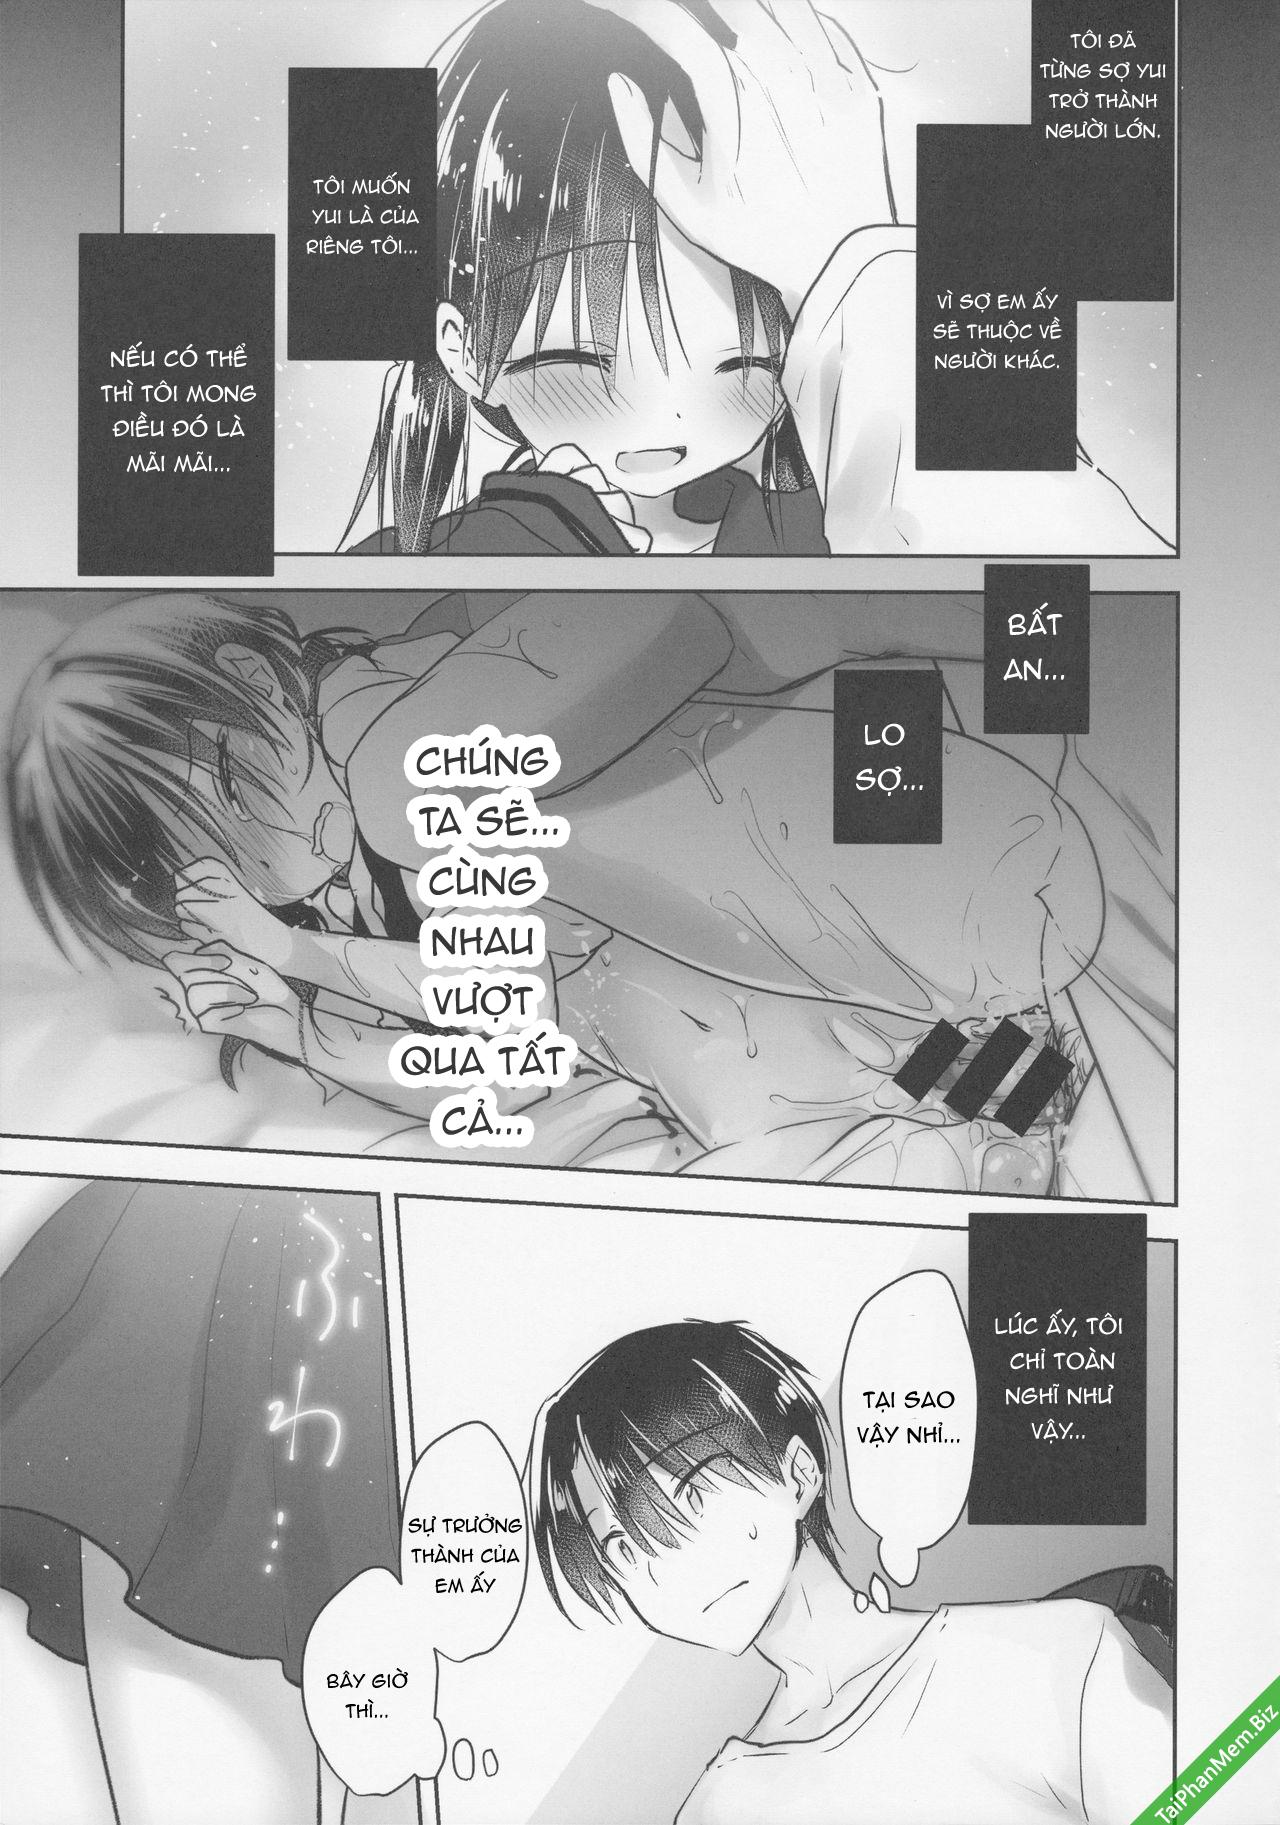 HentaiVN.net - Ảnh 17 - Omocha Sex - Chap 5